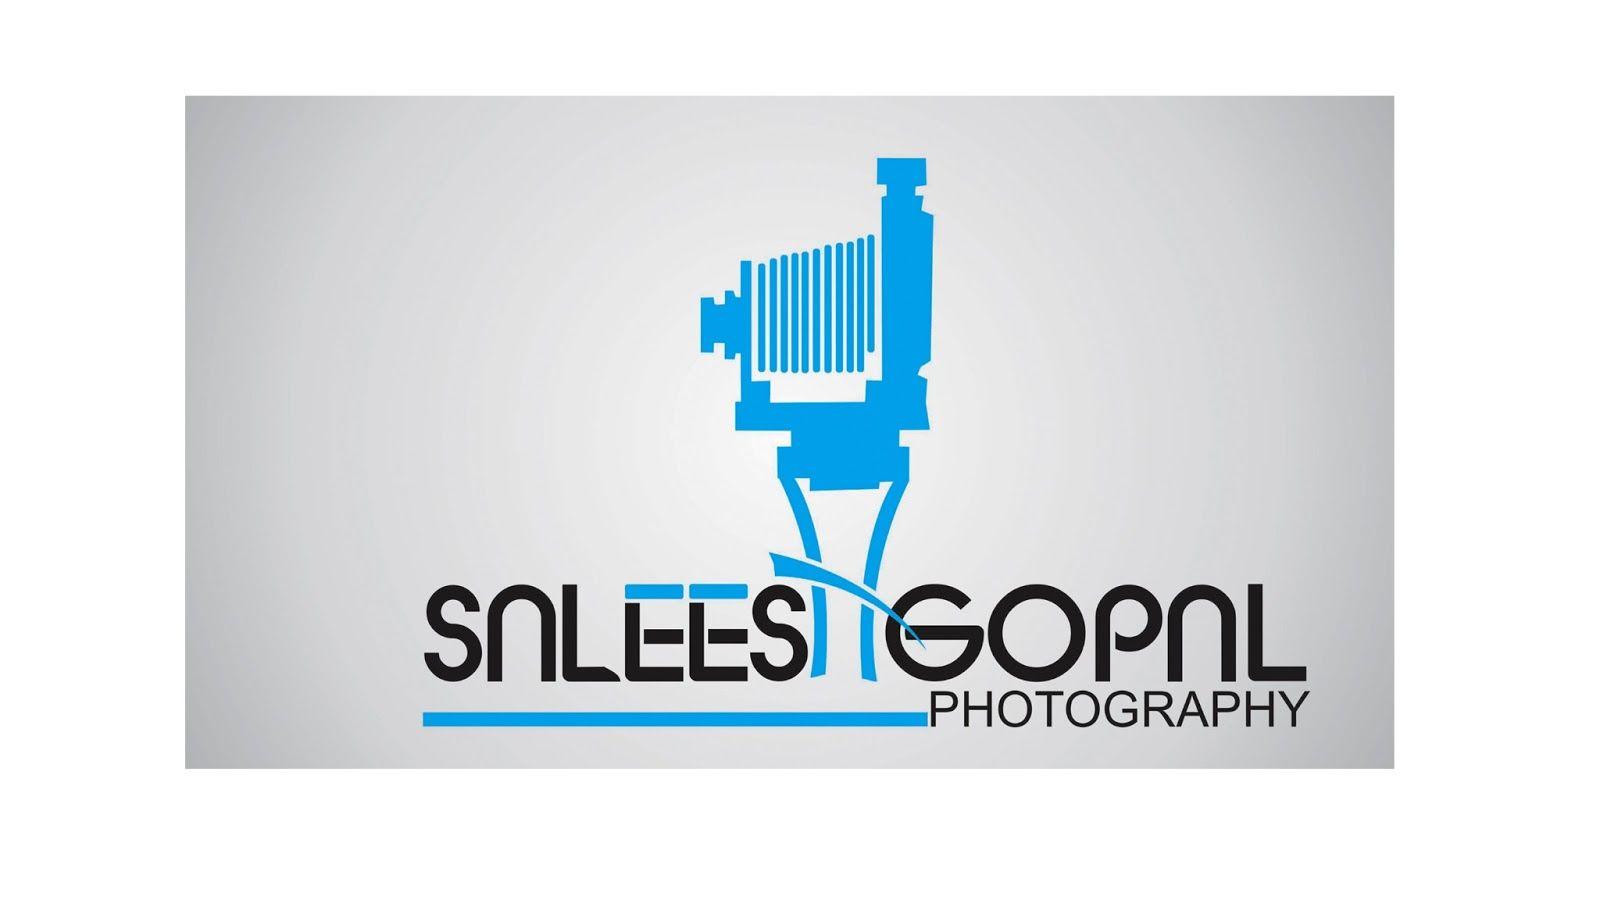 Samples photography logo pinterest photography logos and logos samples photography logos publicscrutiny Choice Image